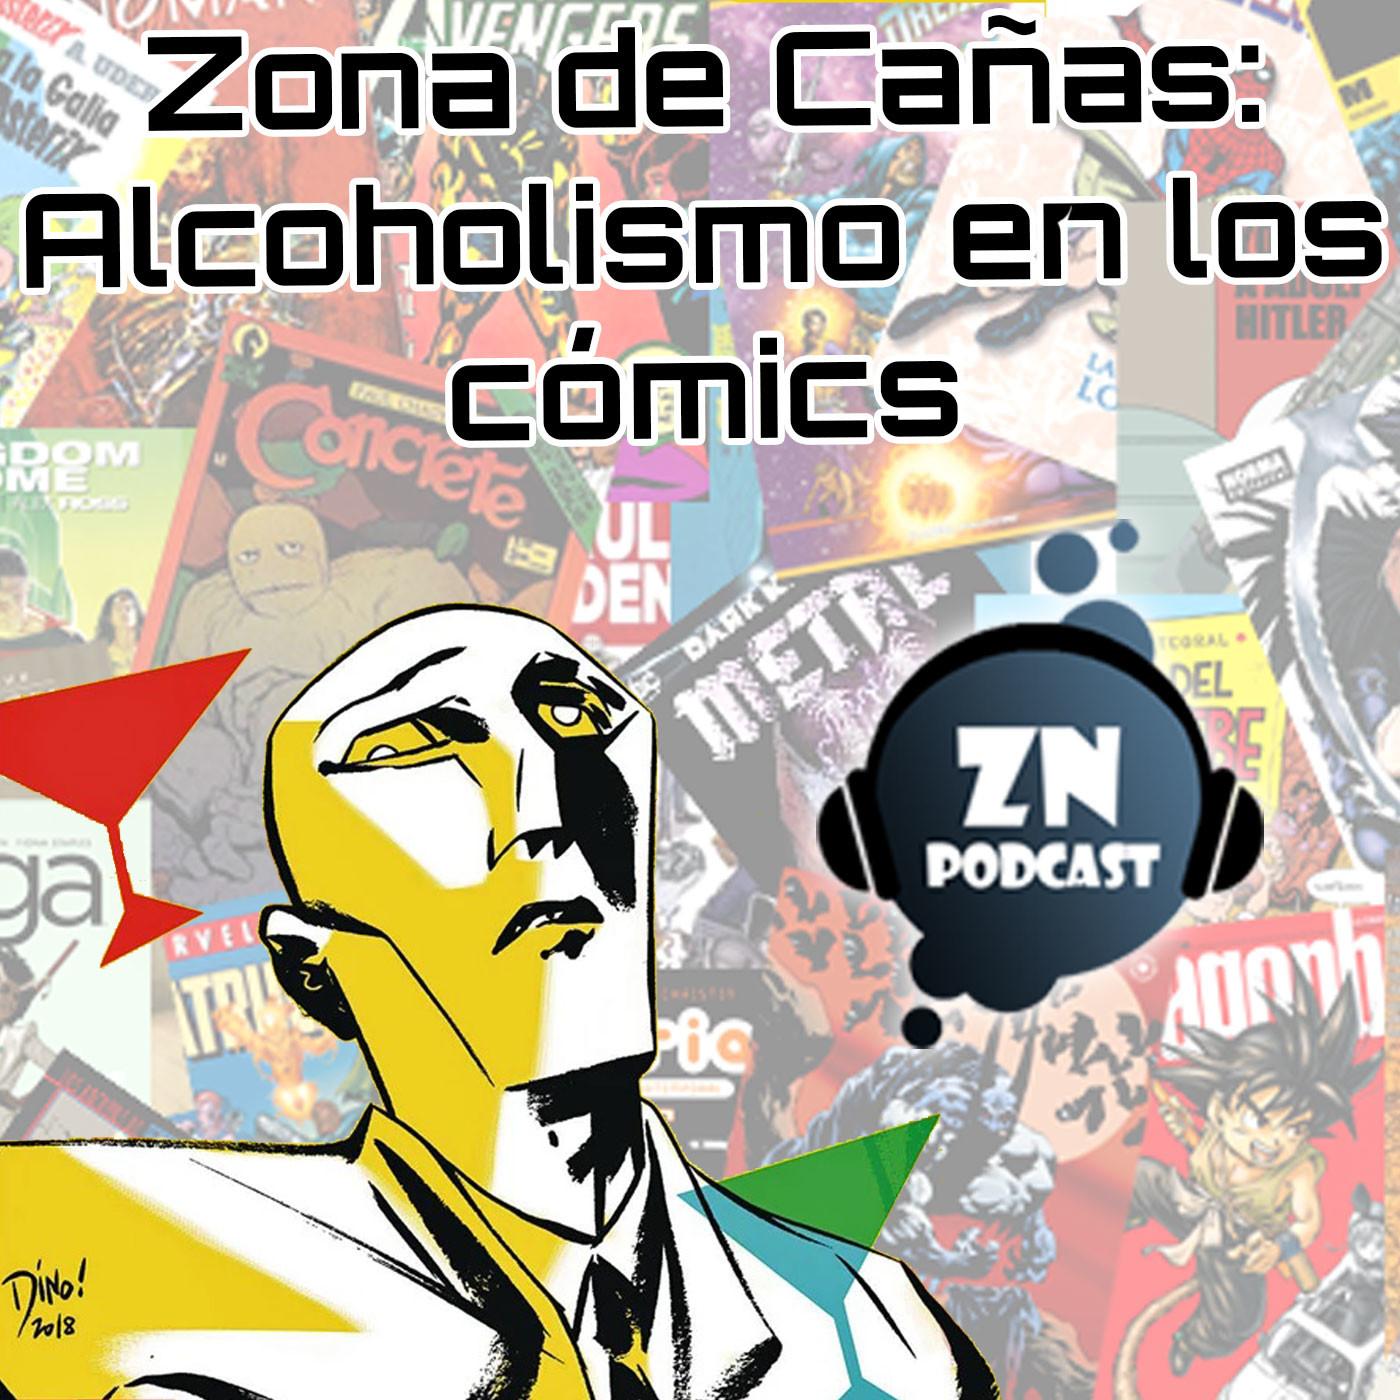 ZNPodcast #82 - Zona de Cañas: Alcoholismo en los cómics